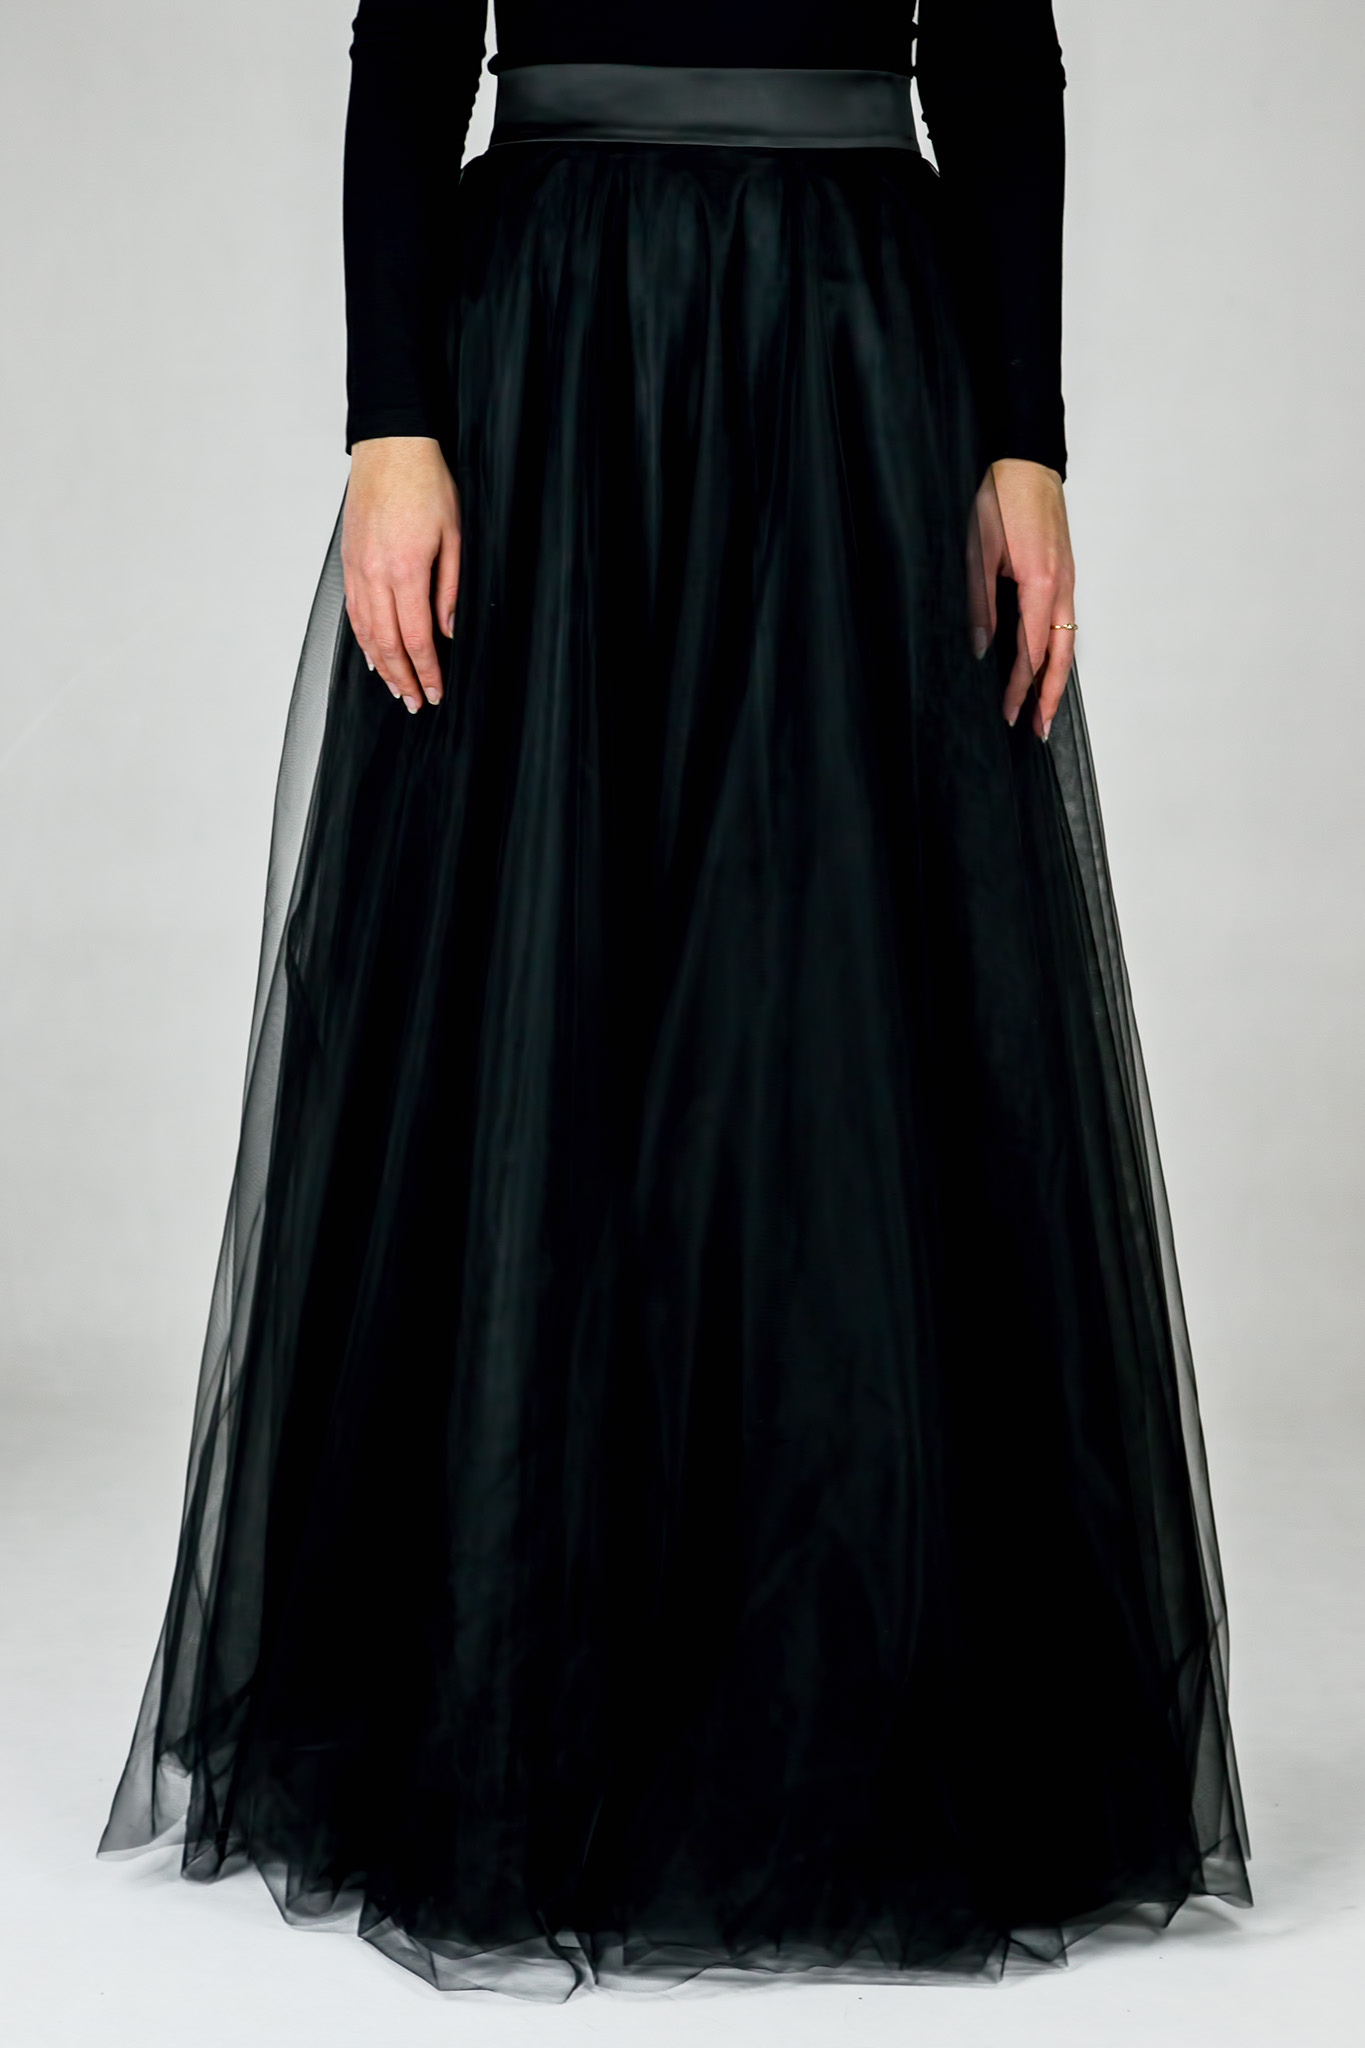 21b8853c329b Dlhá kruhová tylová sukňa - Čierna - Peter a Lucia